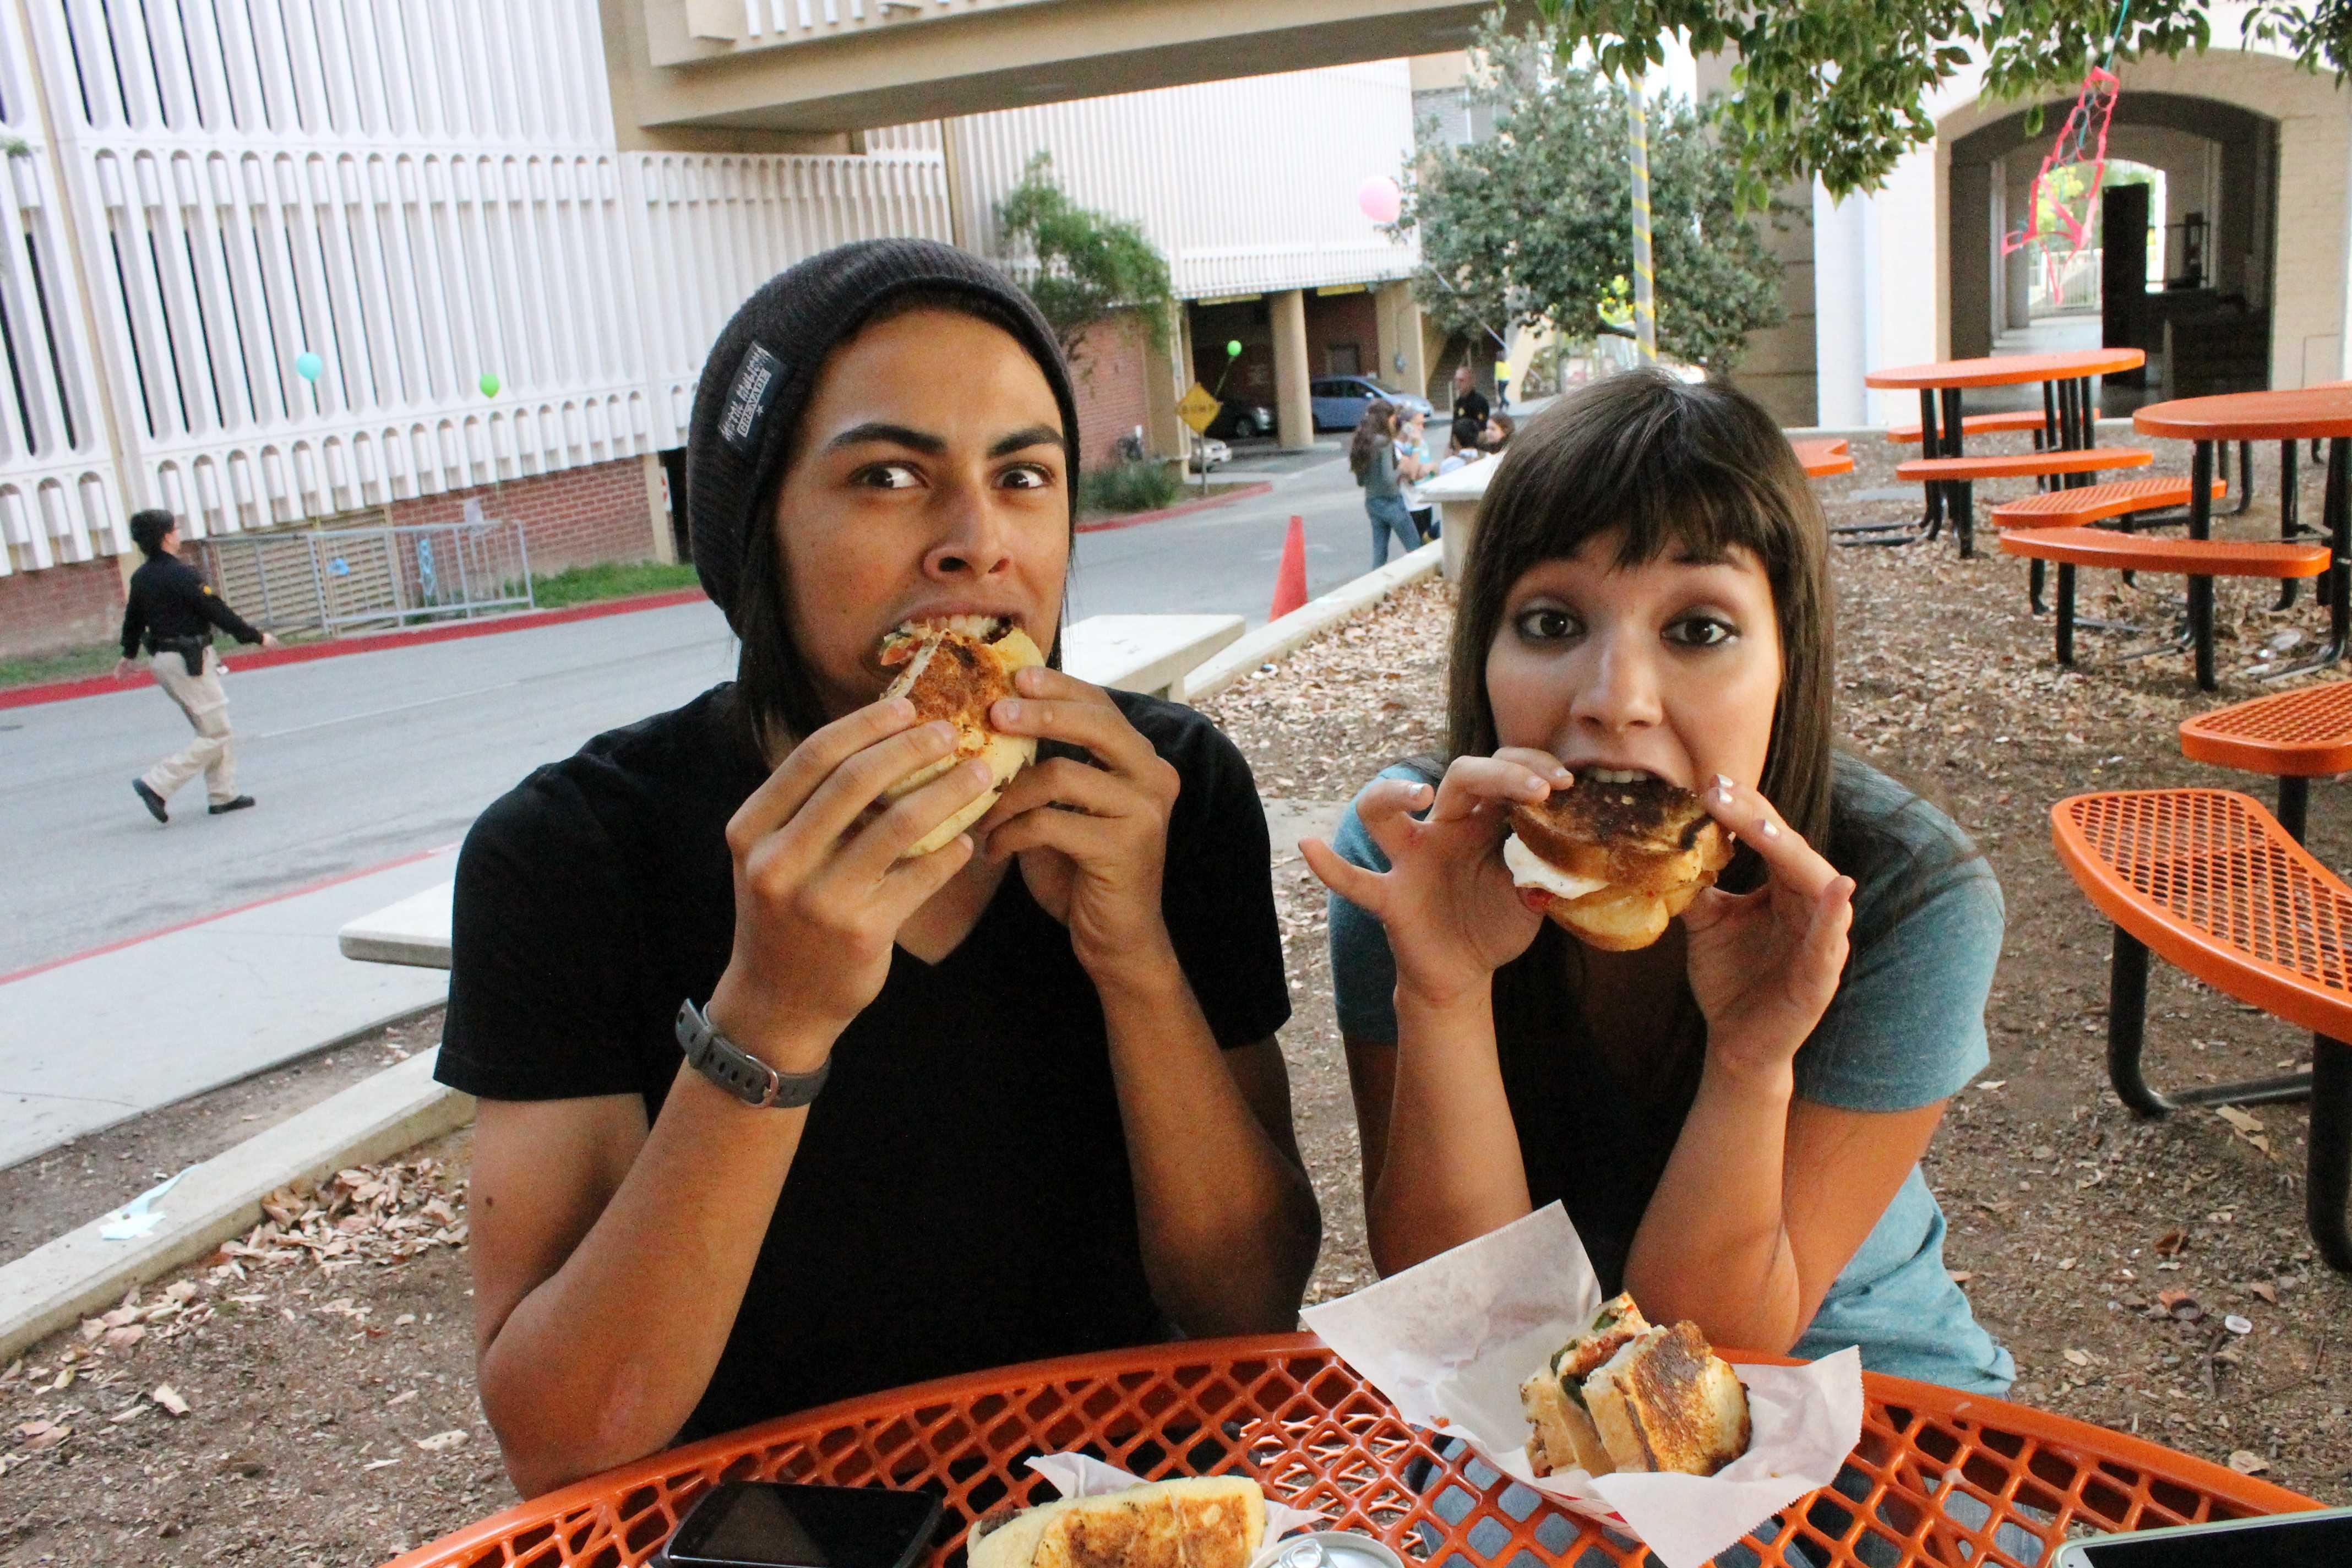 Students enjoy their Holy Aioli sandwiches.